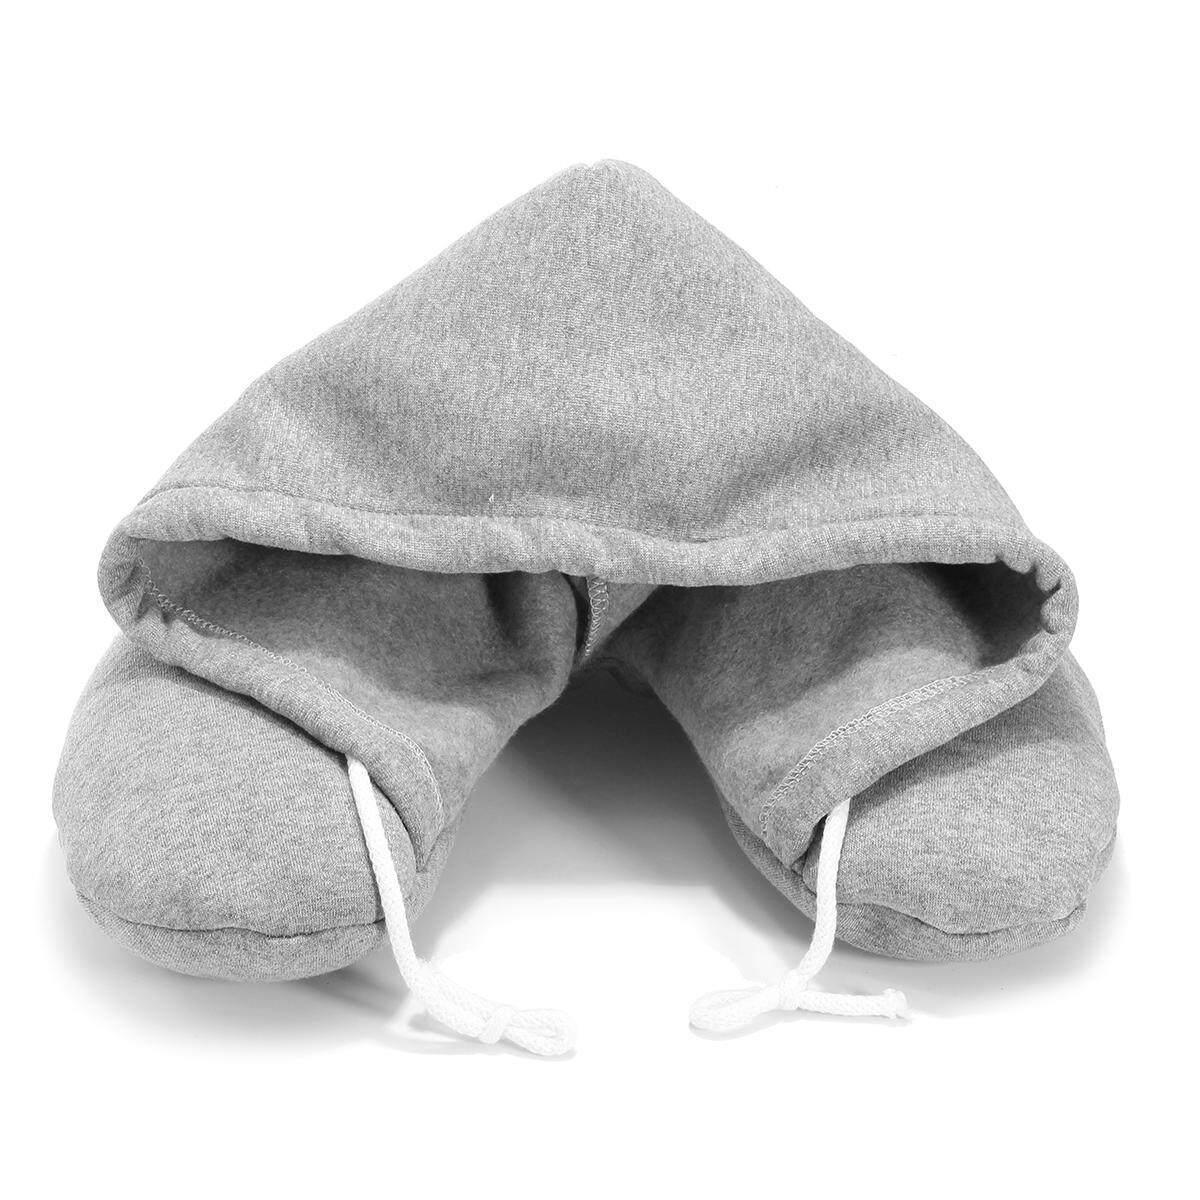 2 Unit Bestway Bantal Angin Biru Kepala Leher Travel Pillow Tiup Promo Source Bertudung Microbead U